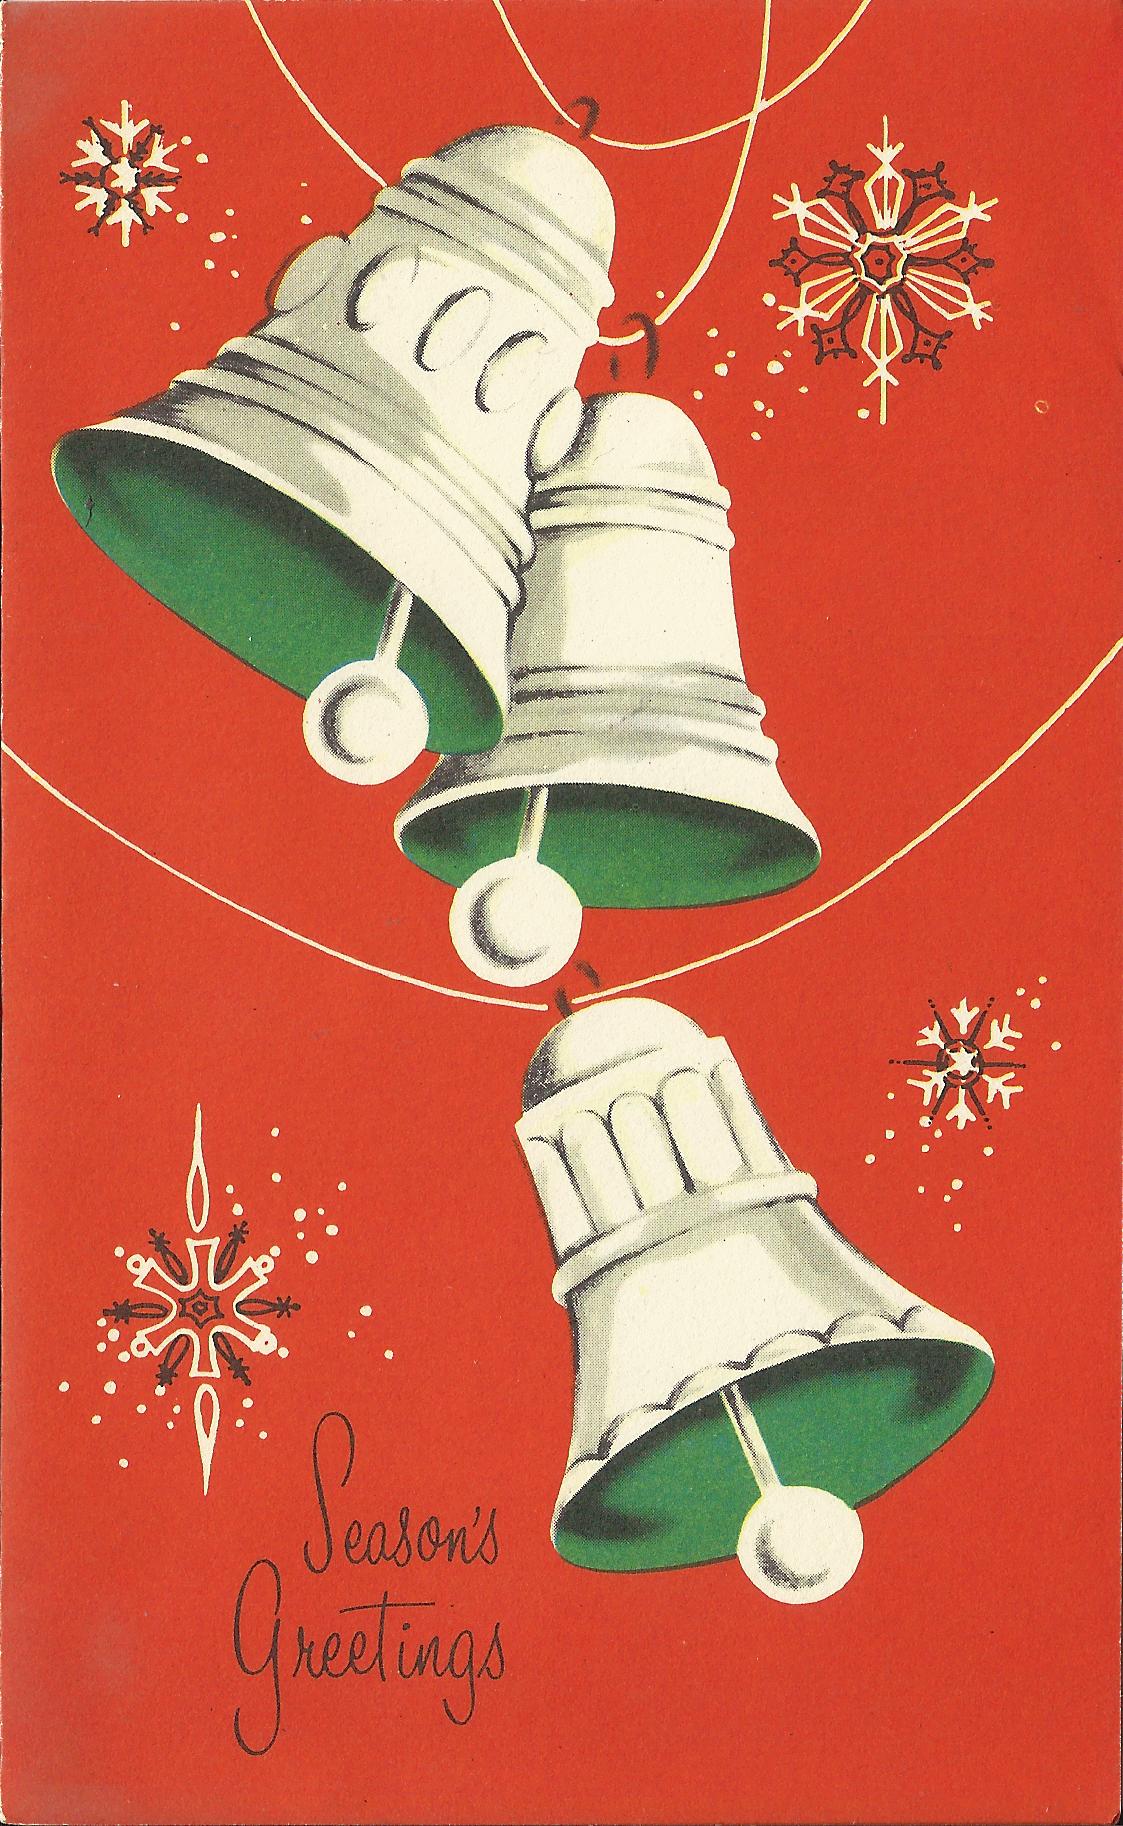 'Season's Greetings' Christmas card - 1959